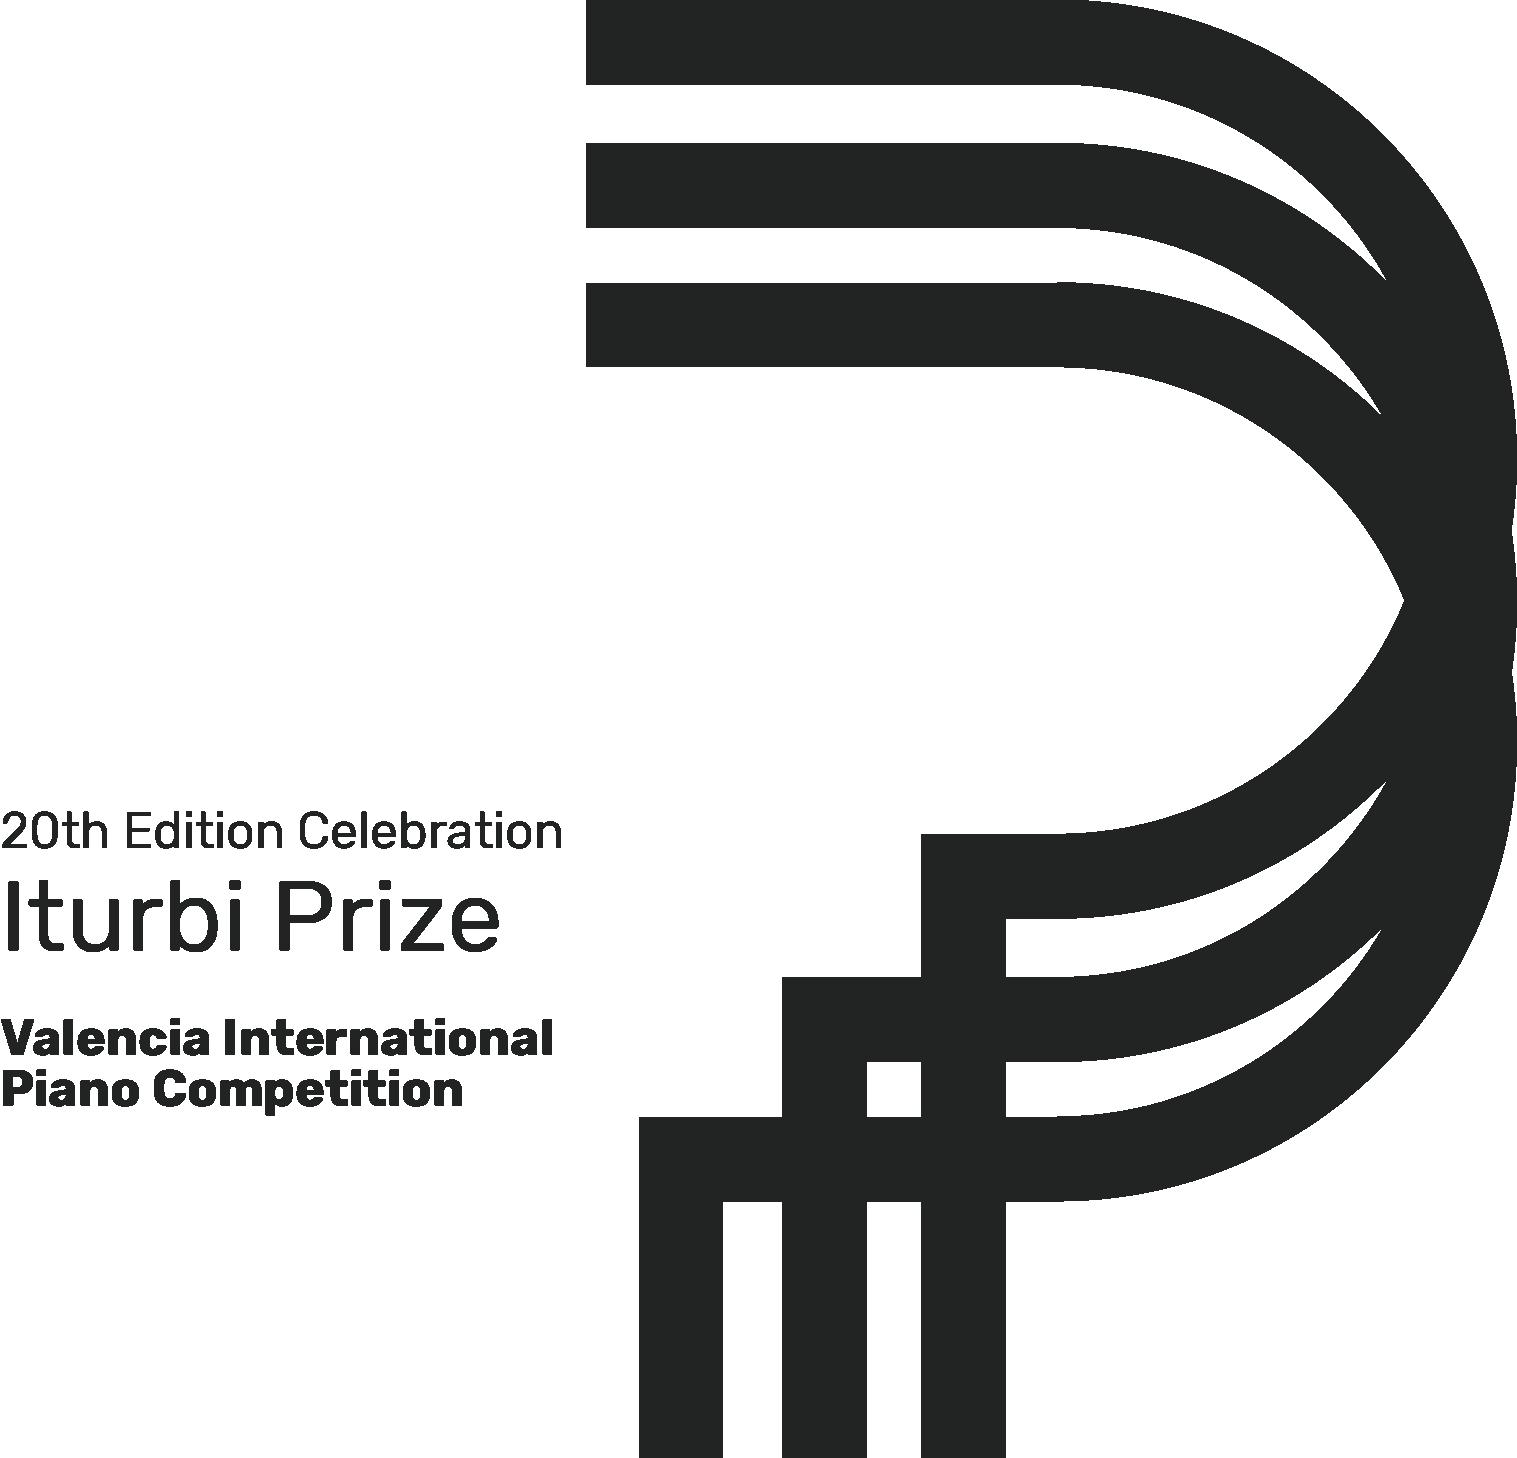 Iturbi Prize